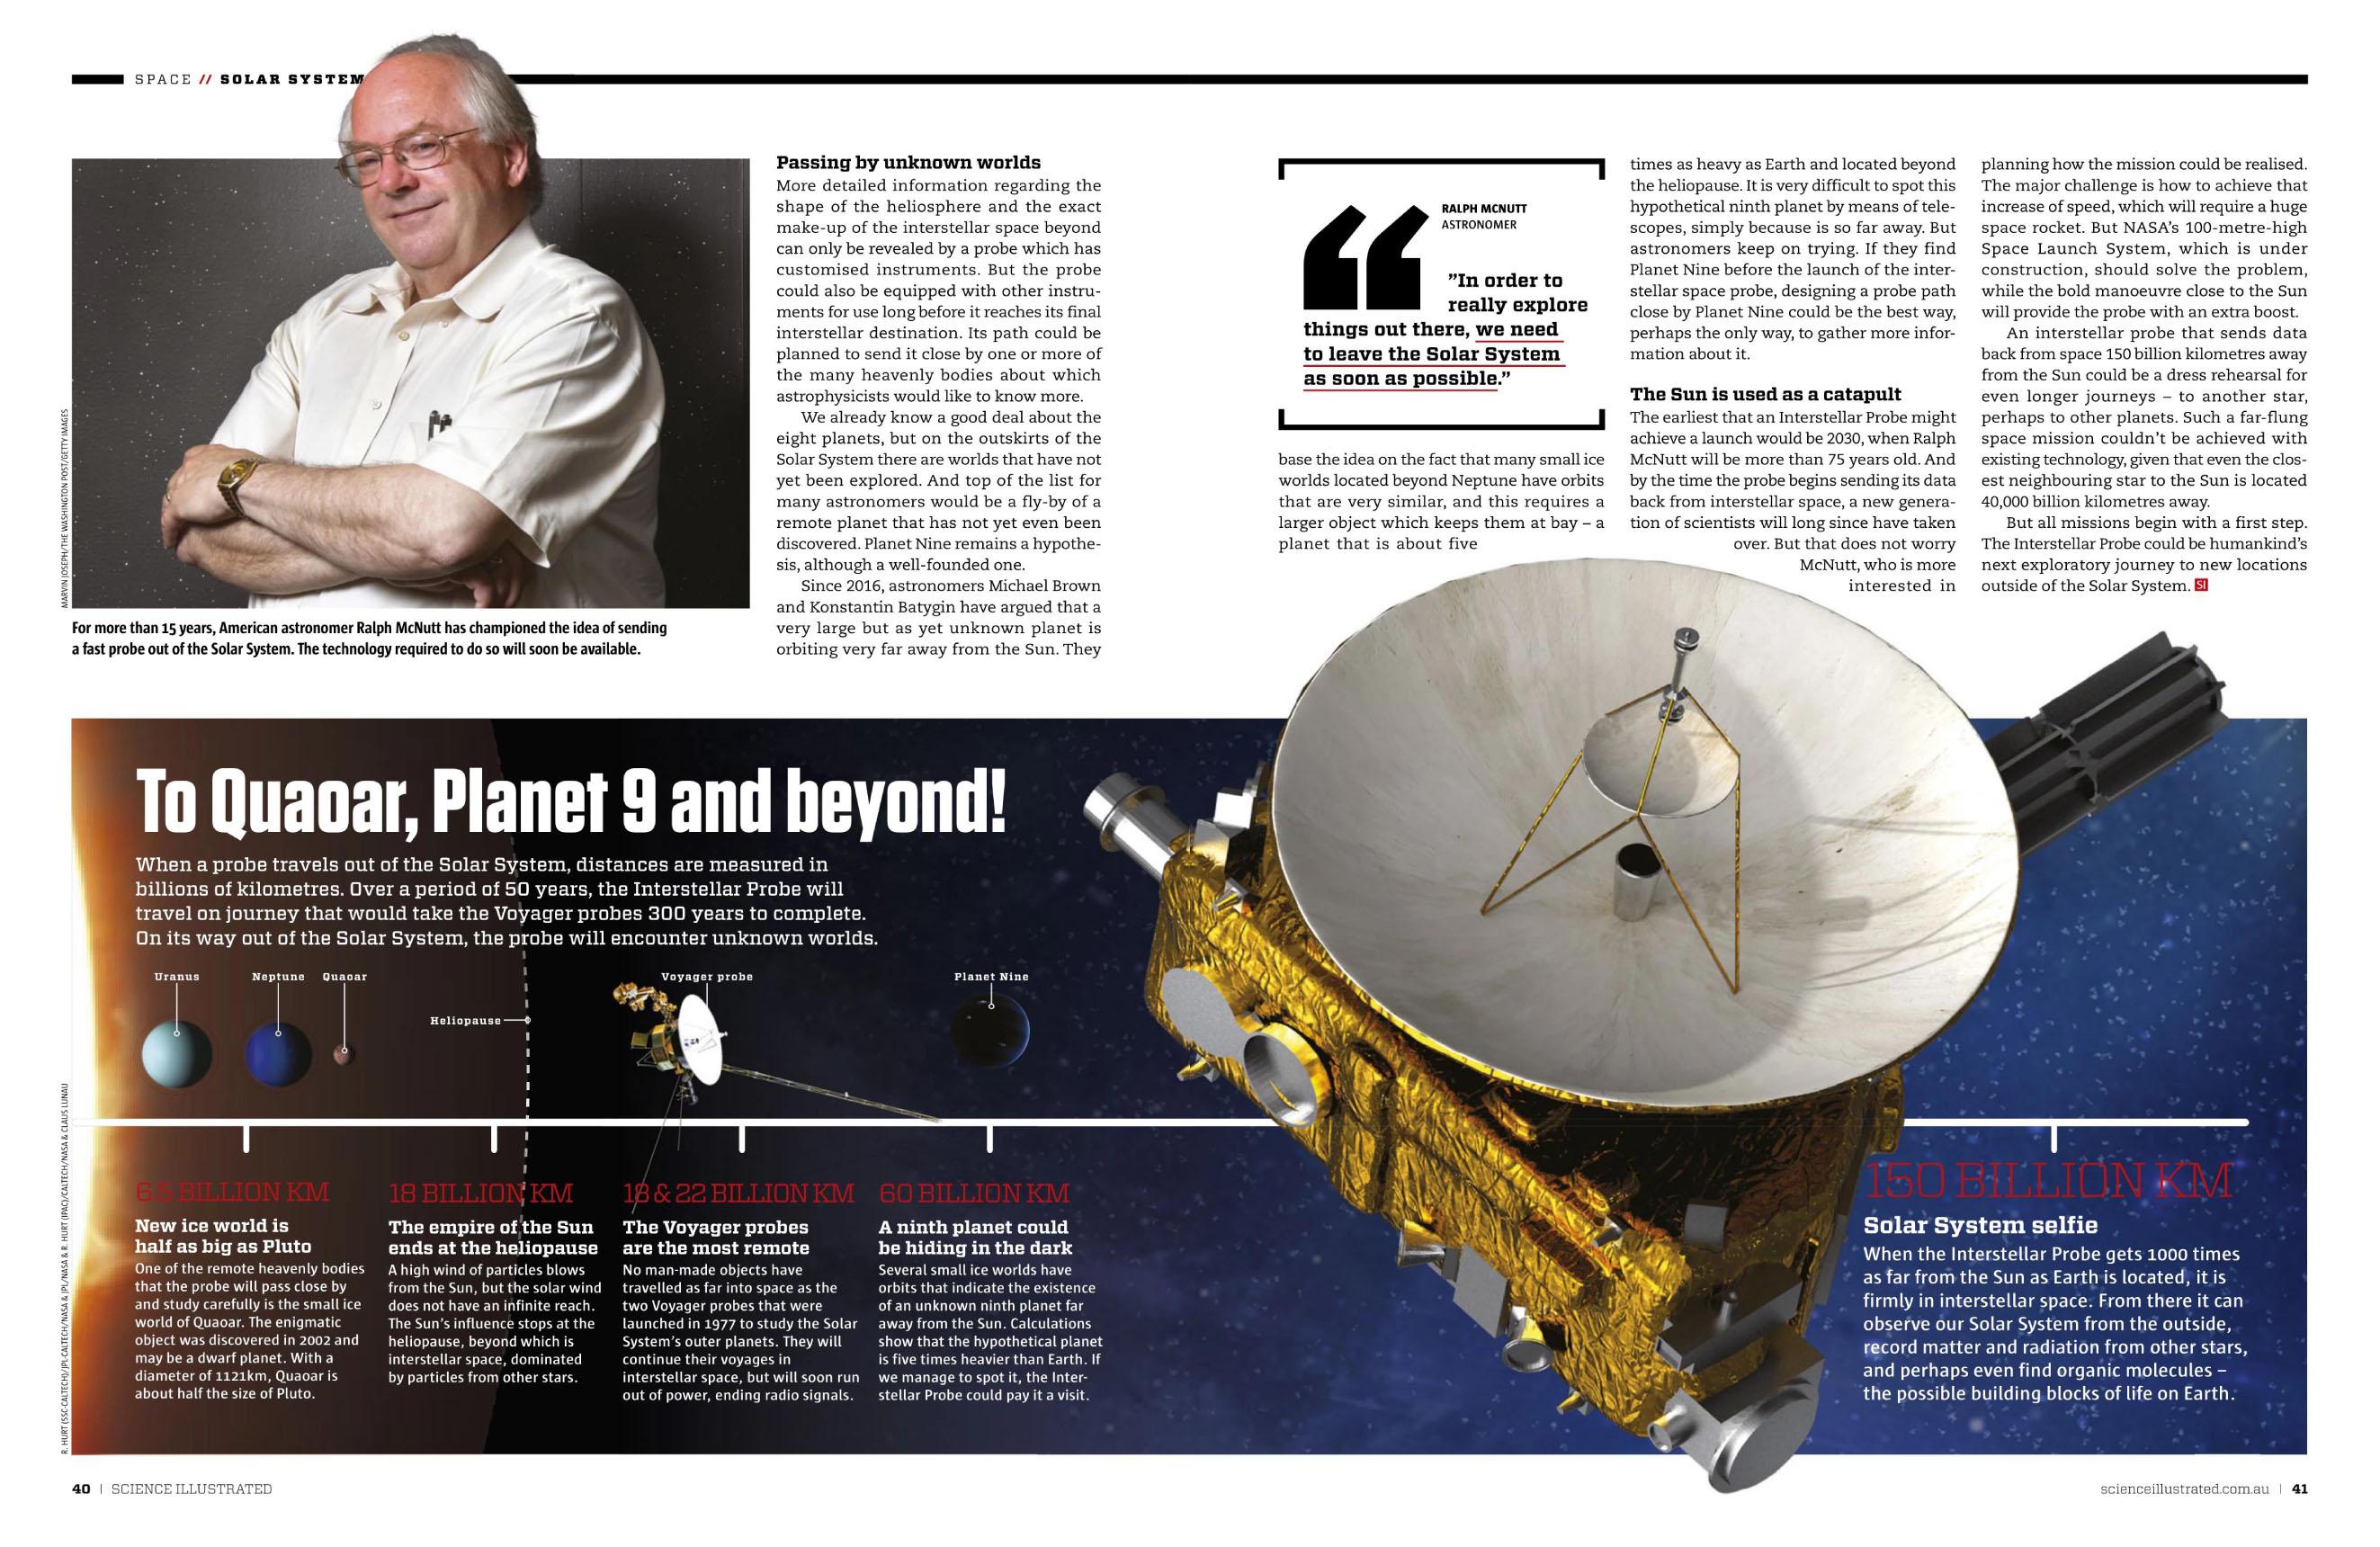 Science Illustrated 077 2020-08 New Probe 04.jpg